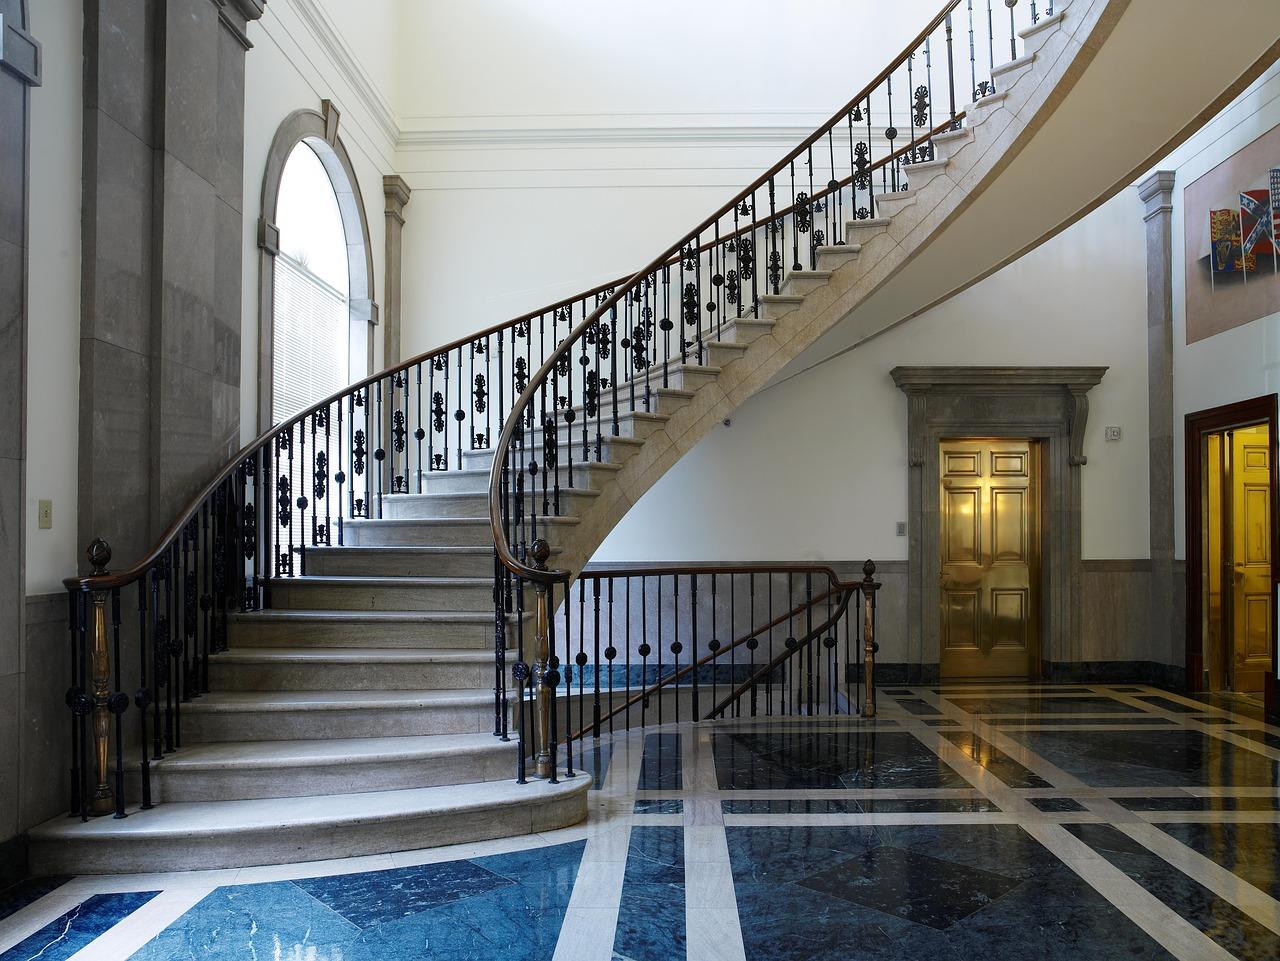 Incredibly elegant staircase